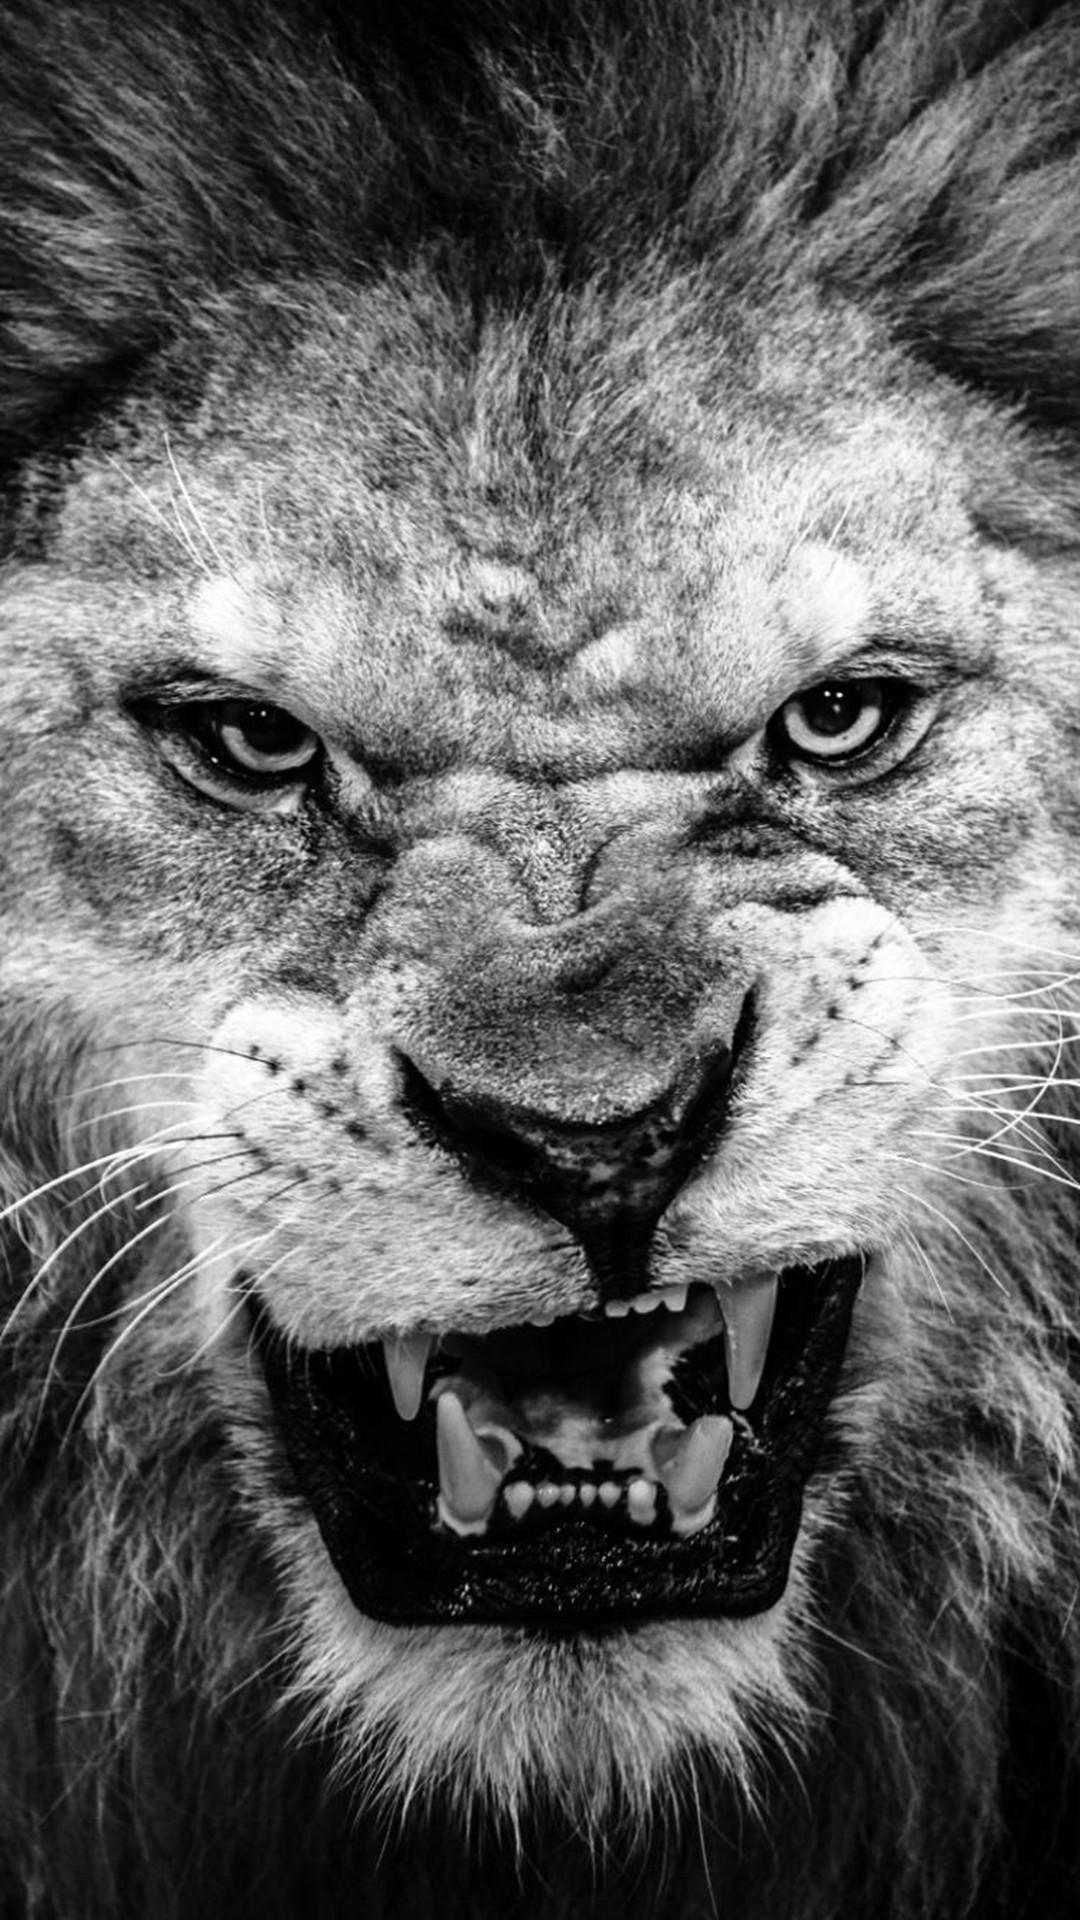 Dark Fierce Lion Face Macro iPhone 6 wallpaper